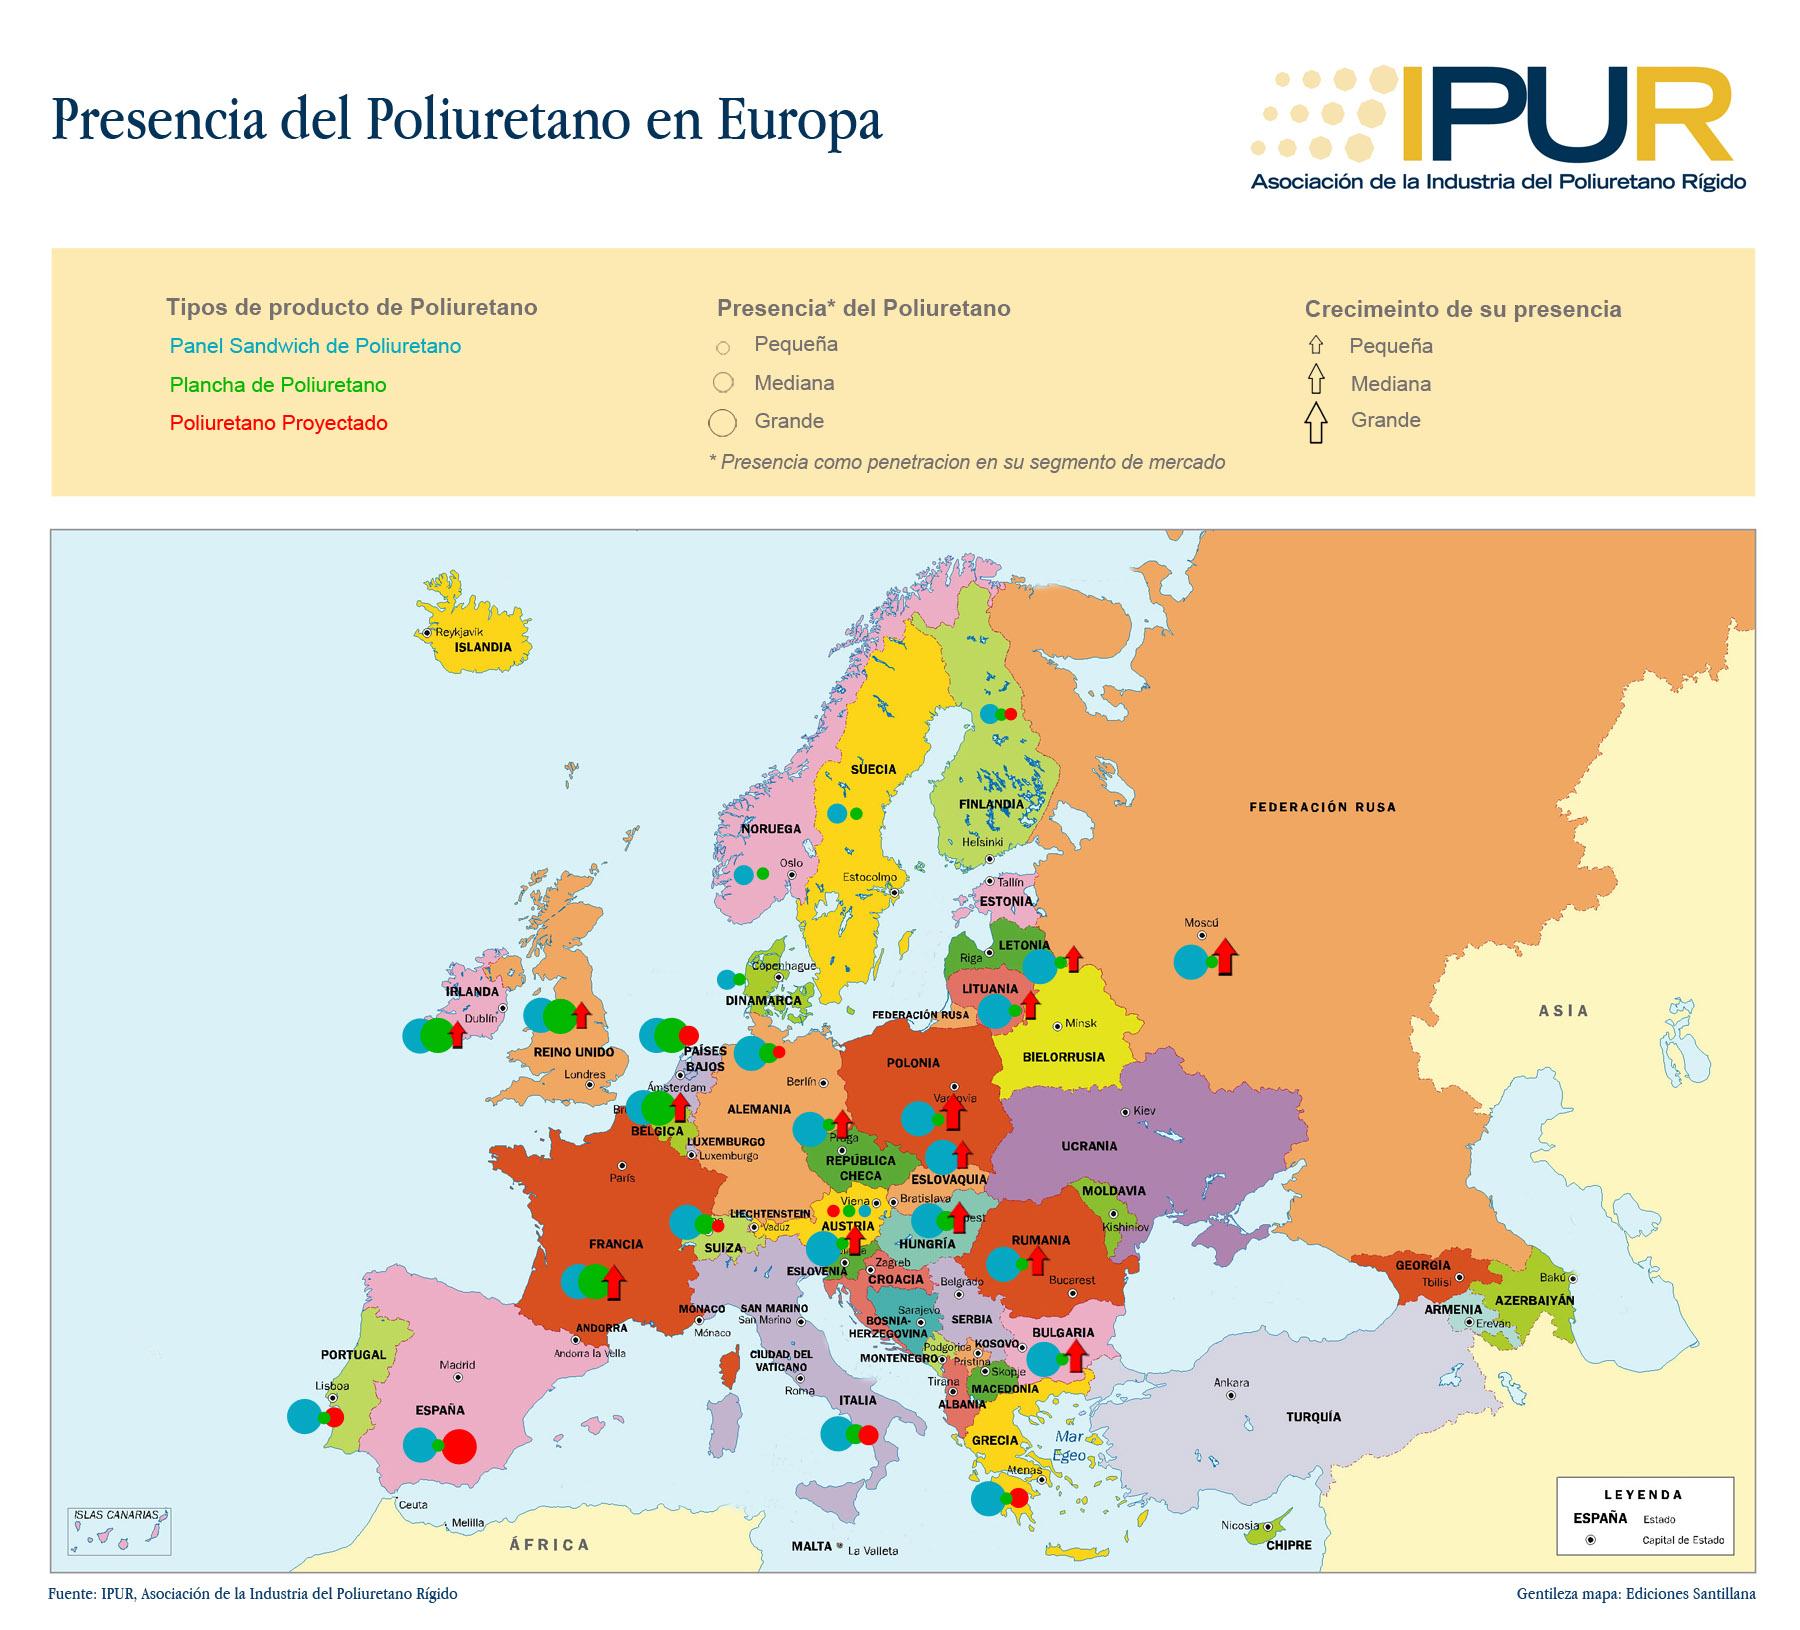 Mapa presencia del poliuretano en Europa by IPUR